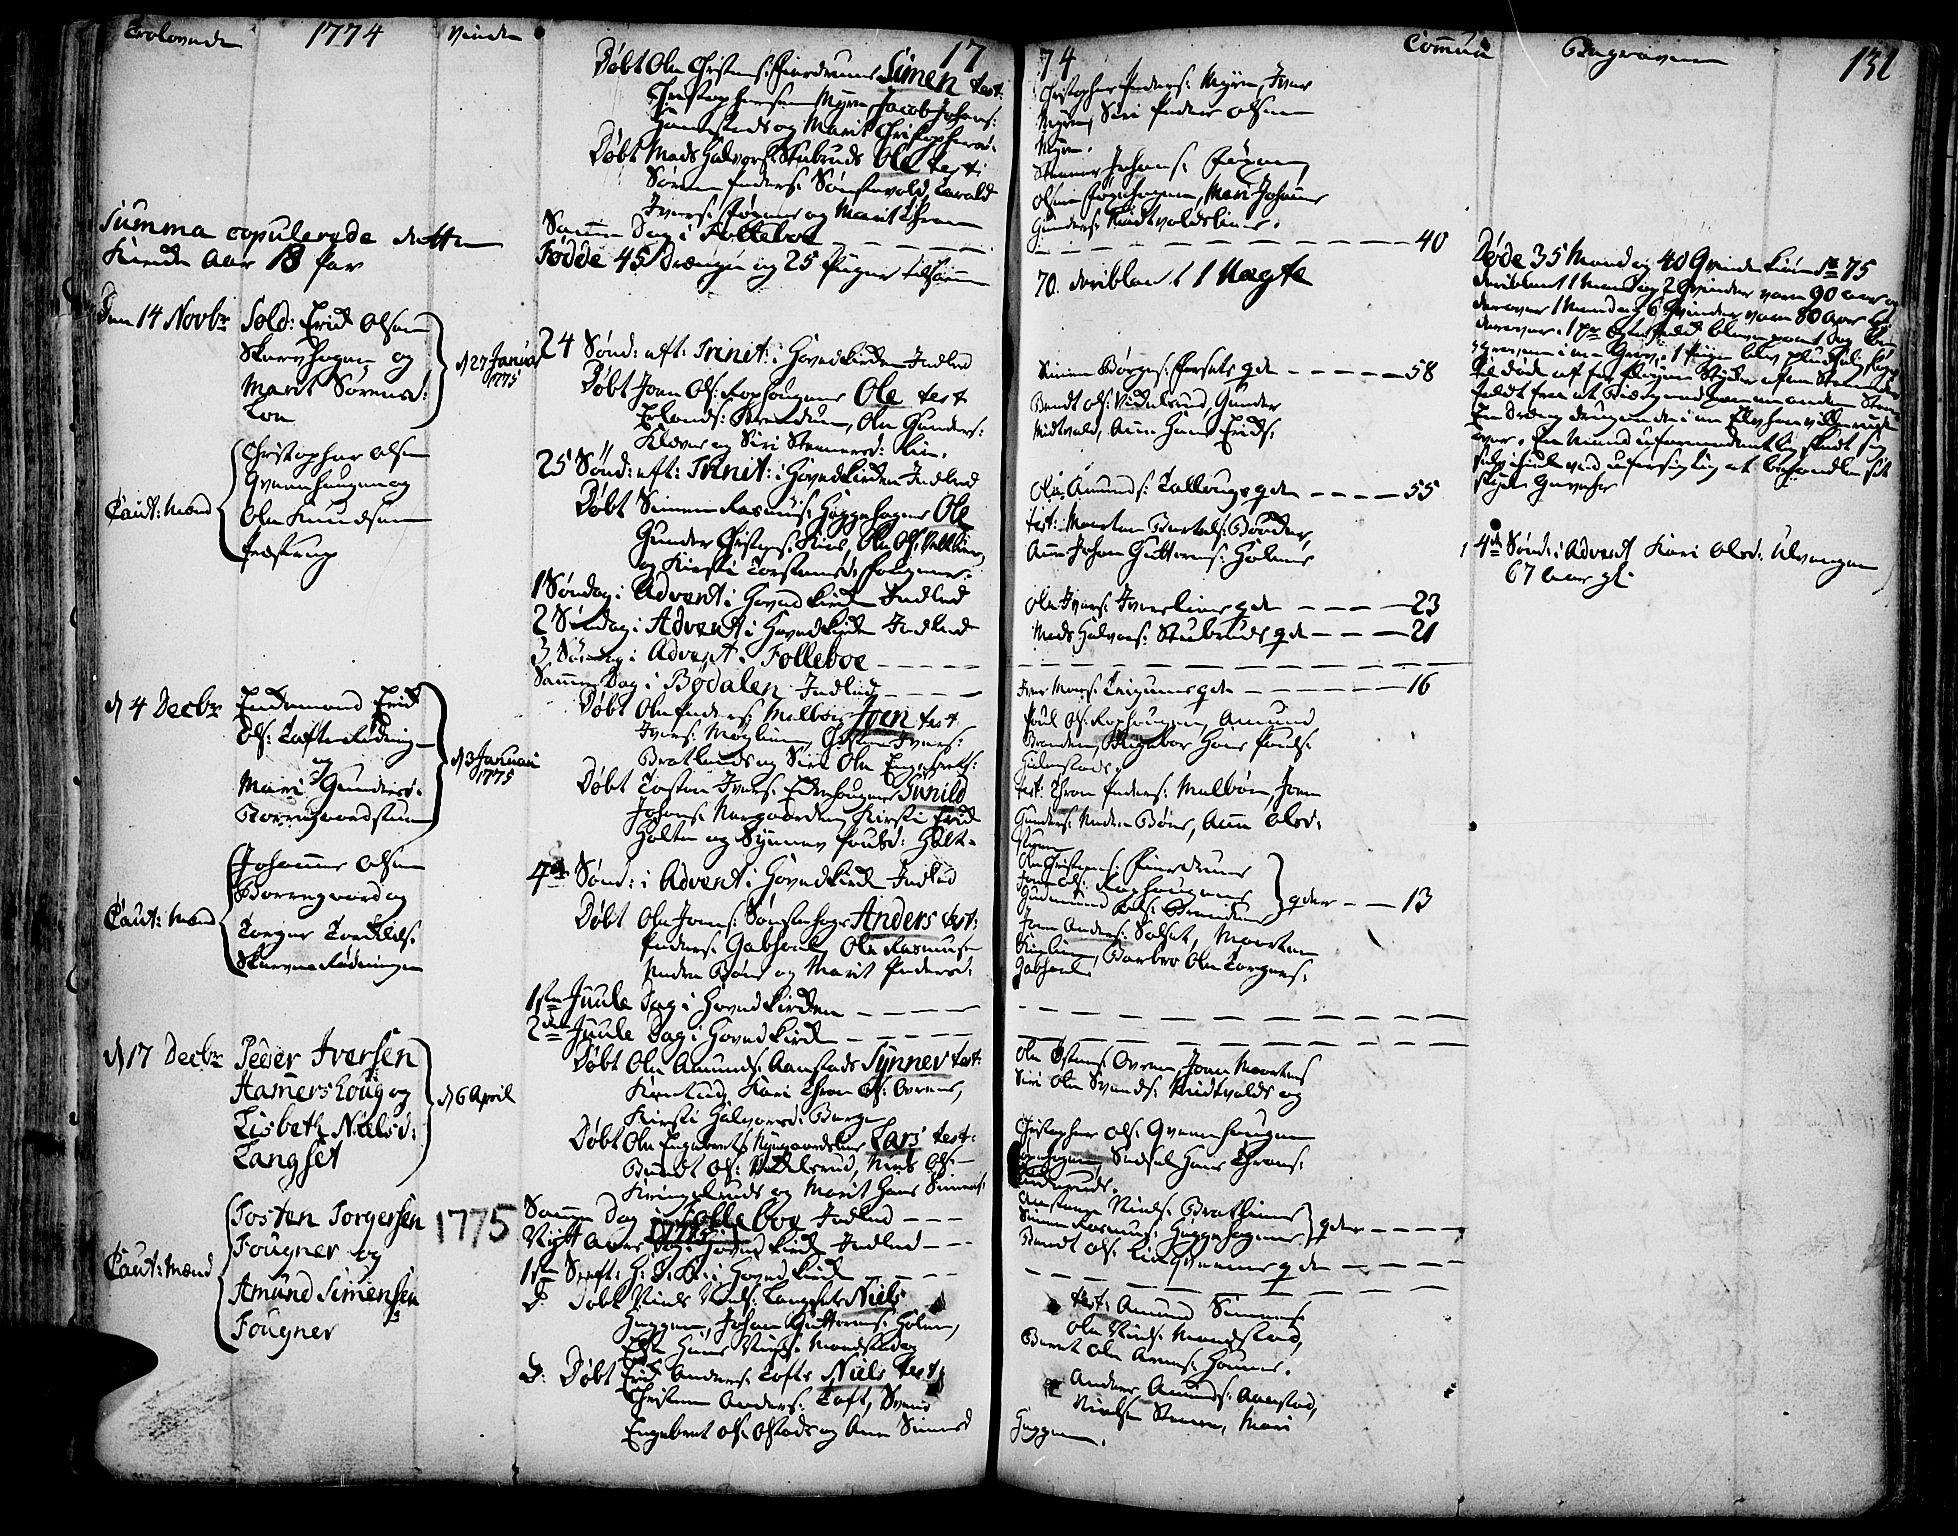 SAH, Gausdal prestekontor, Ministerialbok nr. 3, 1758-1809, s. 131